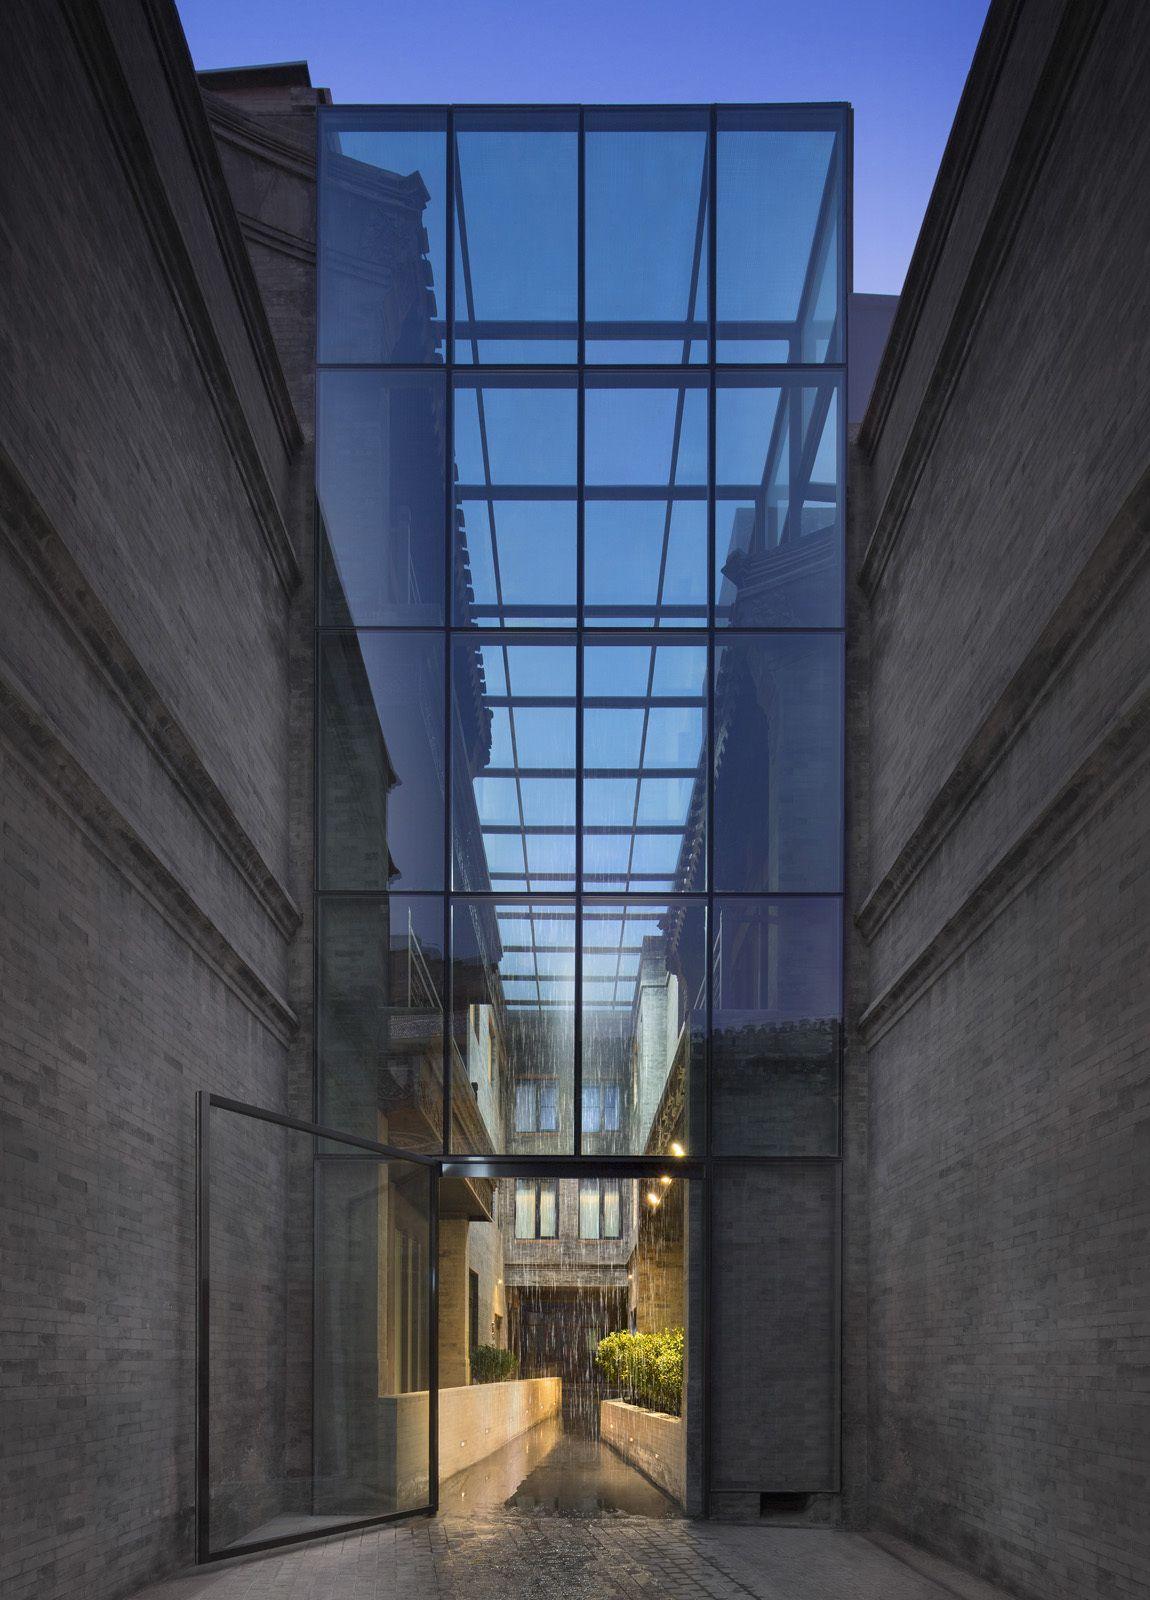 asap adam sokol architecture practice is hiring architectural